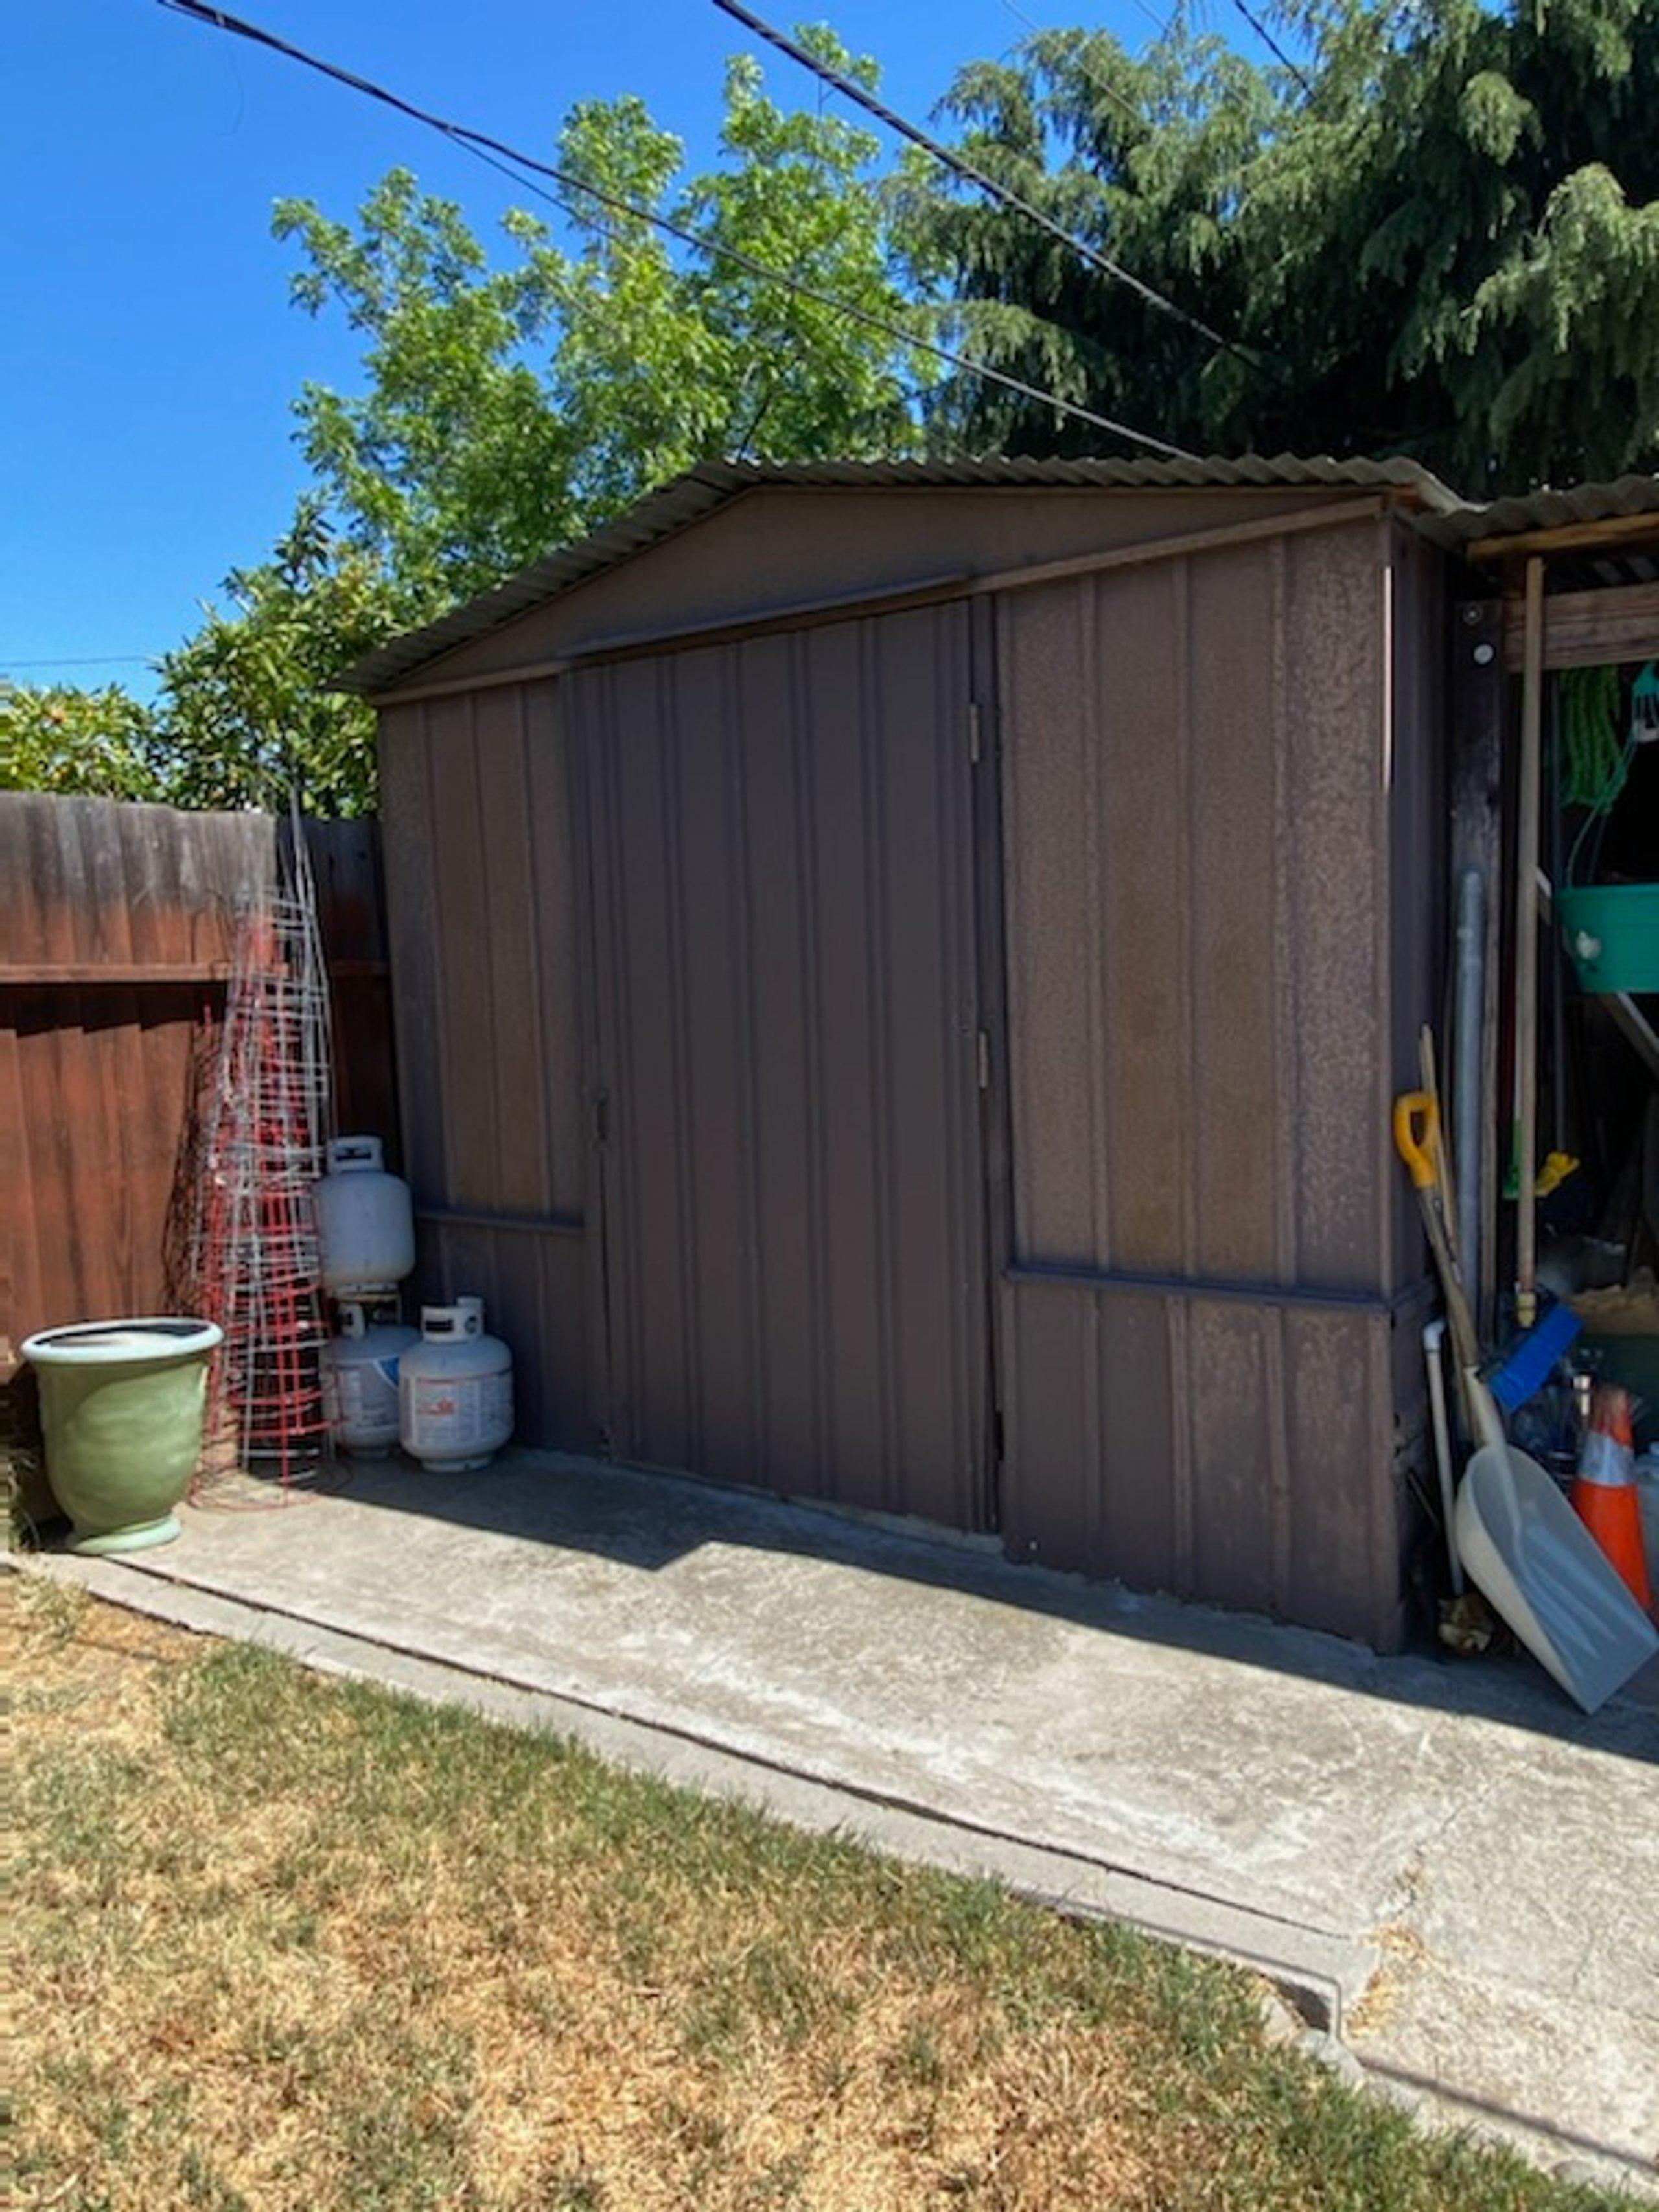 8x6 Shed self storage unit